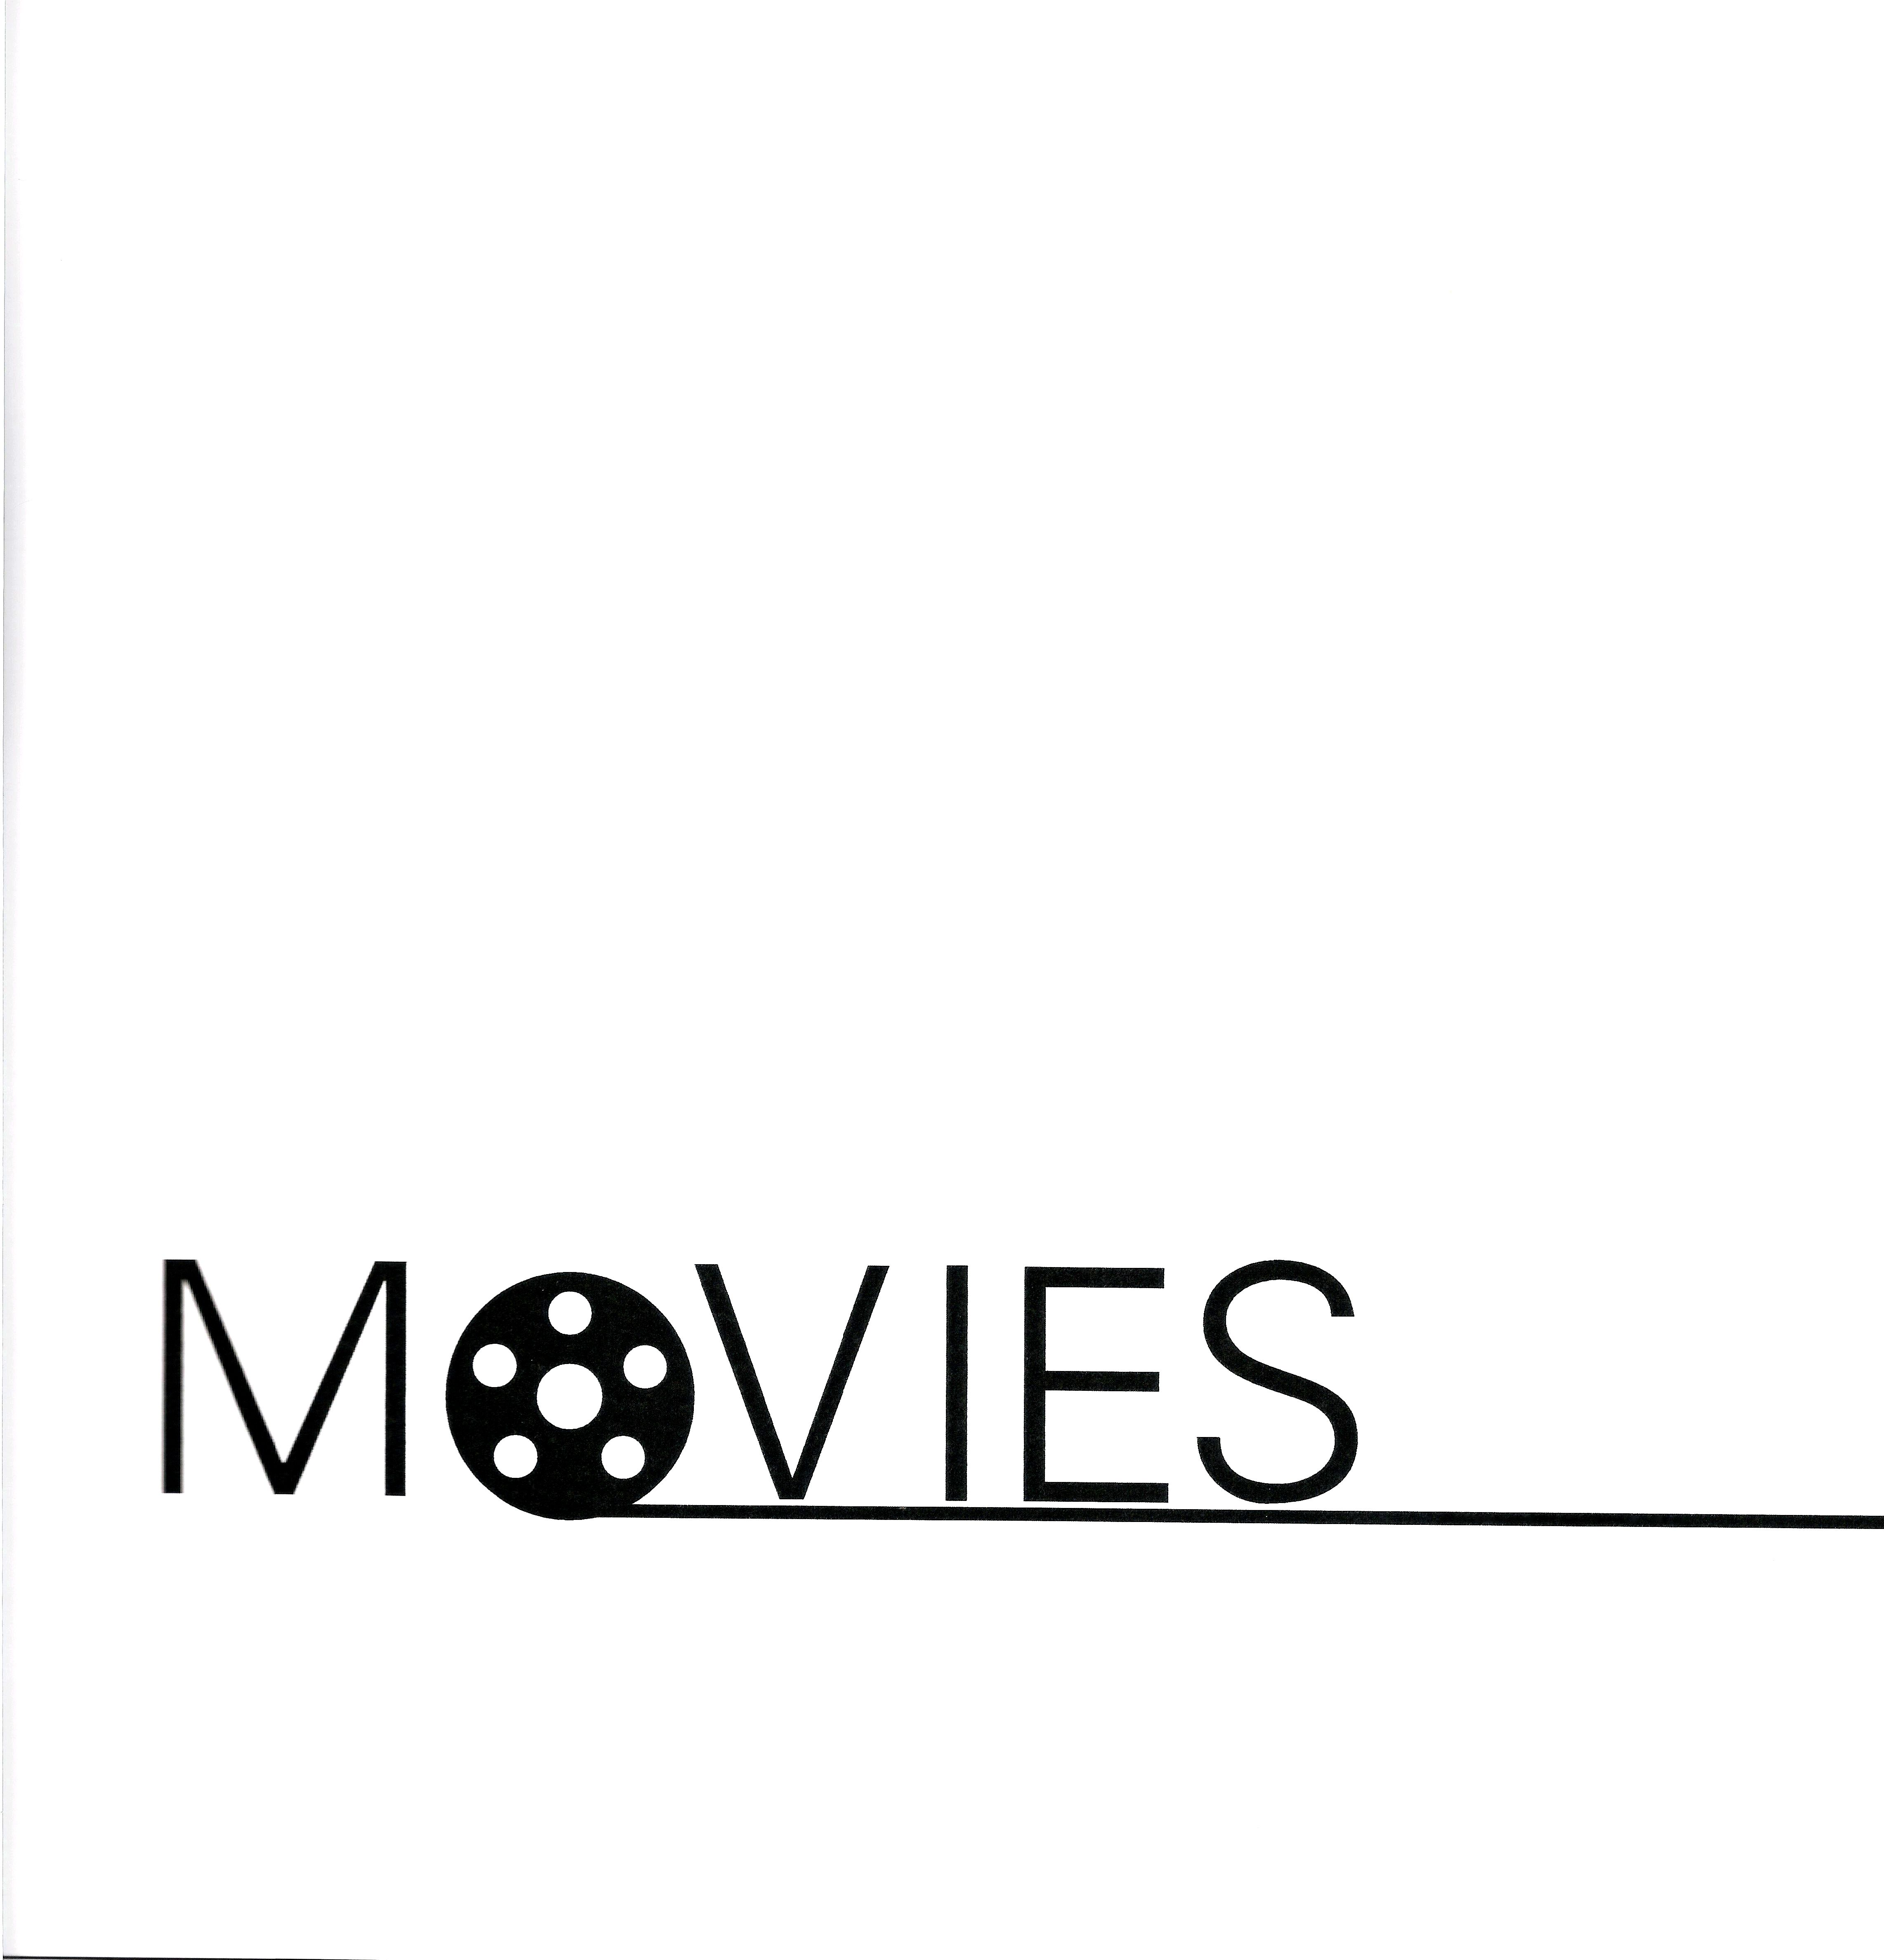 45+ Movies logo information